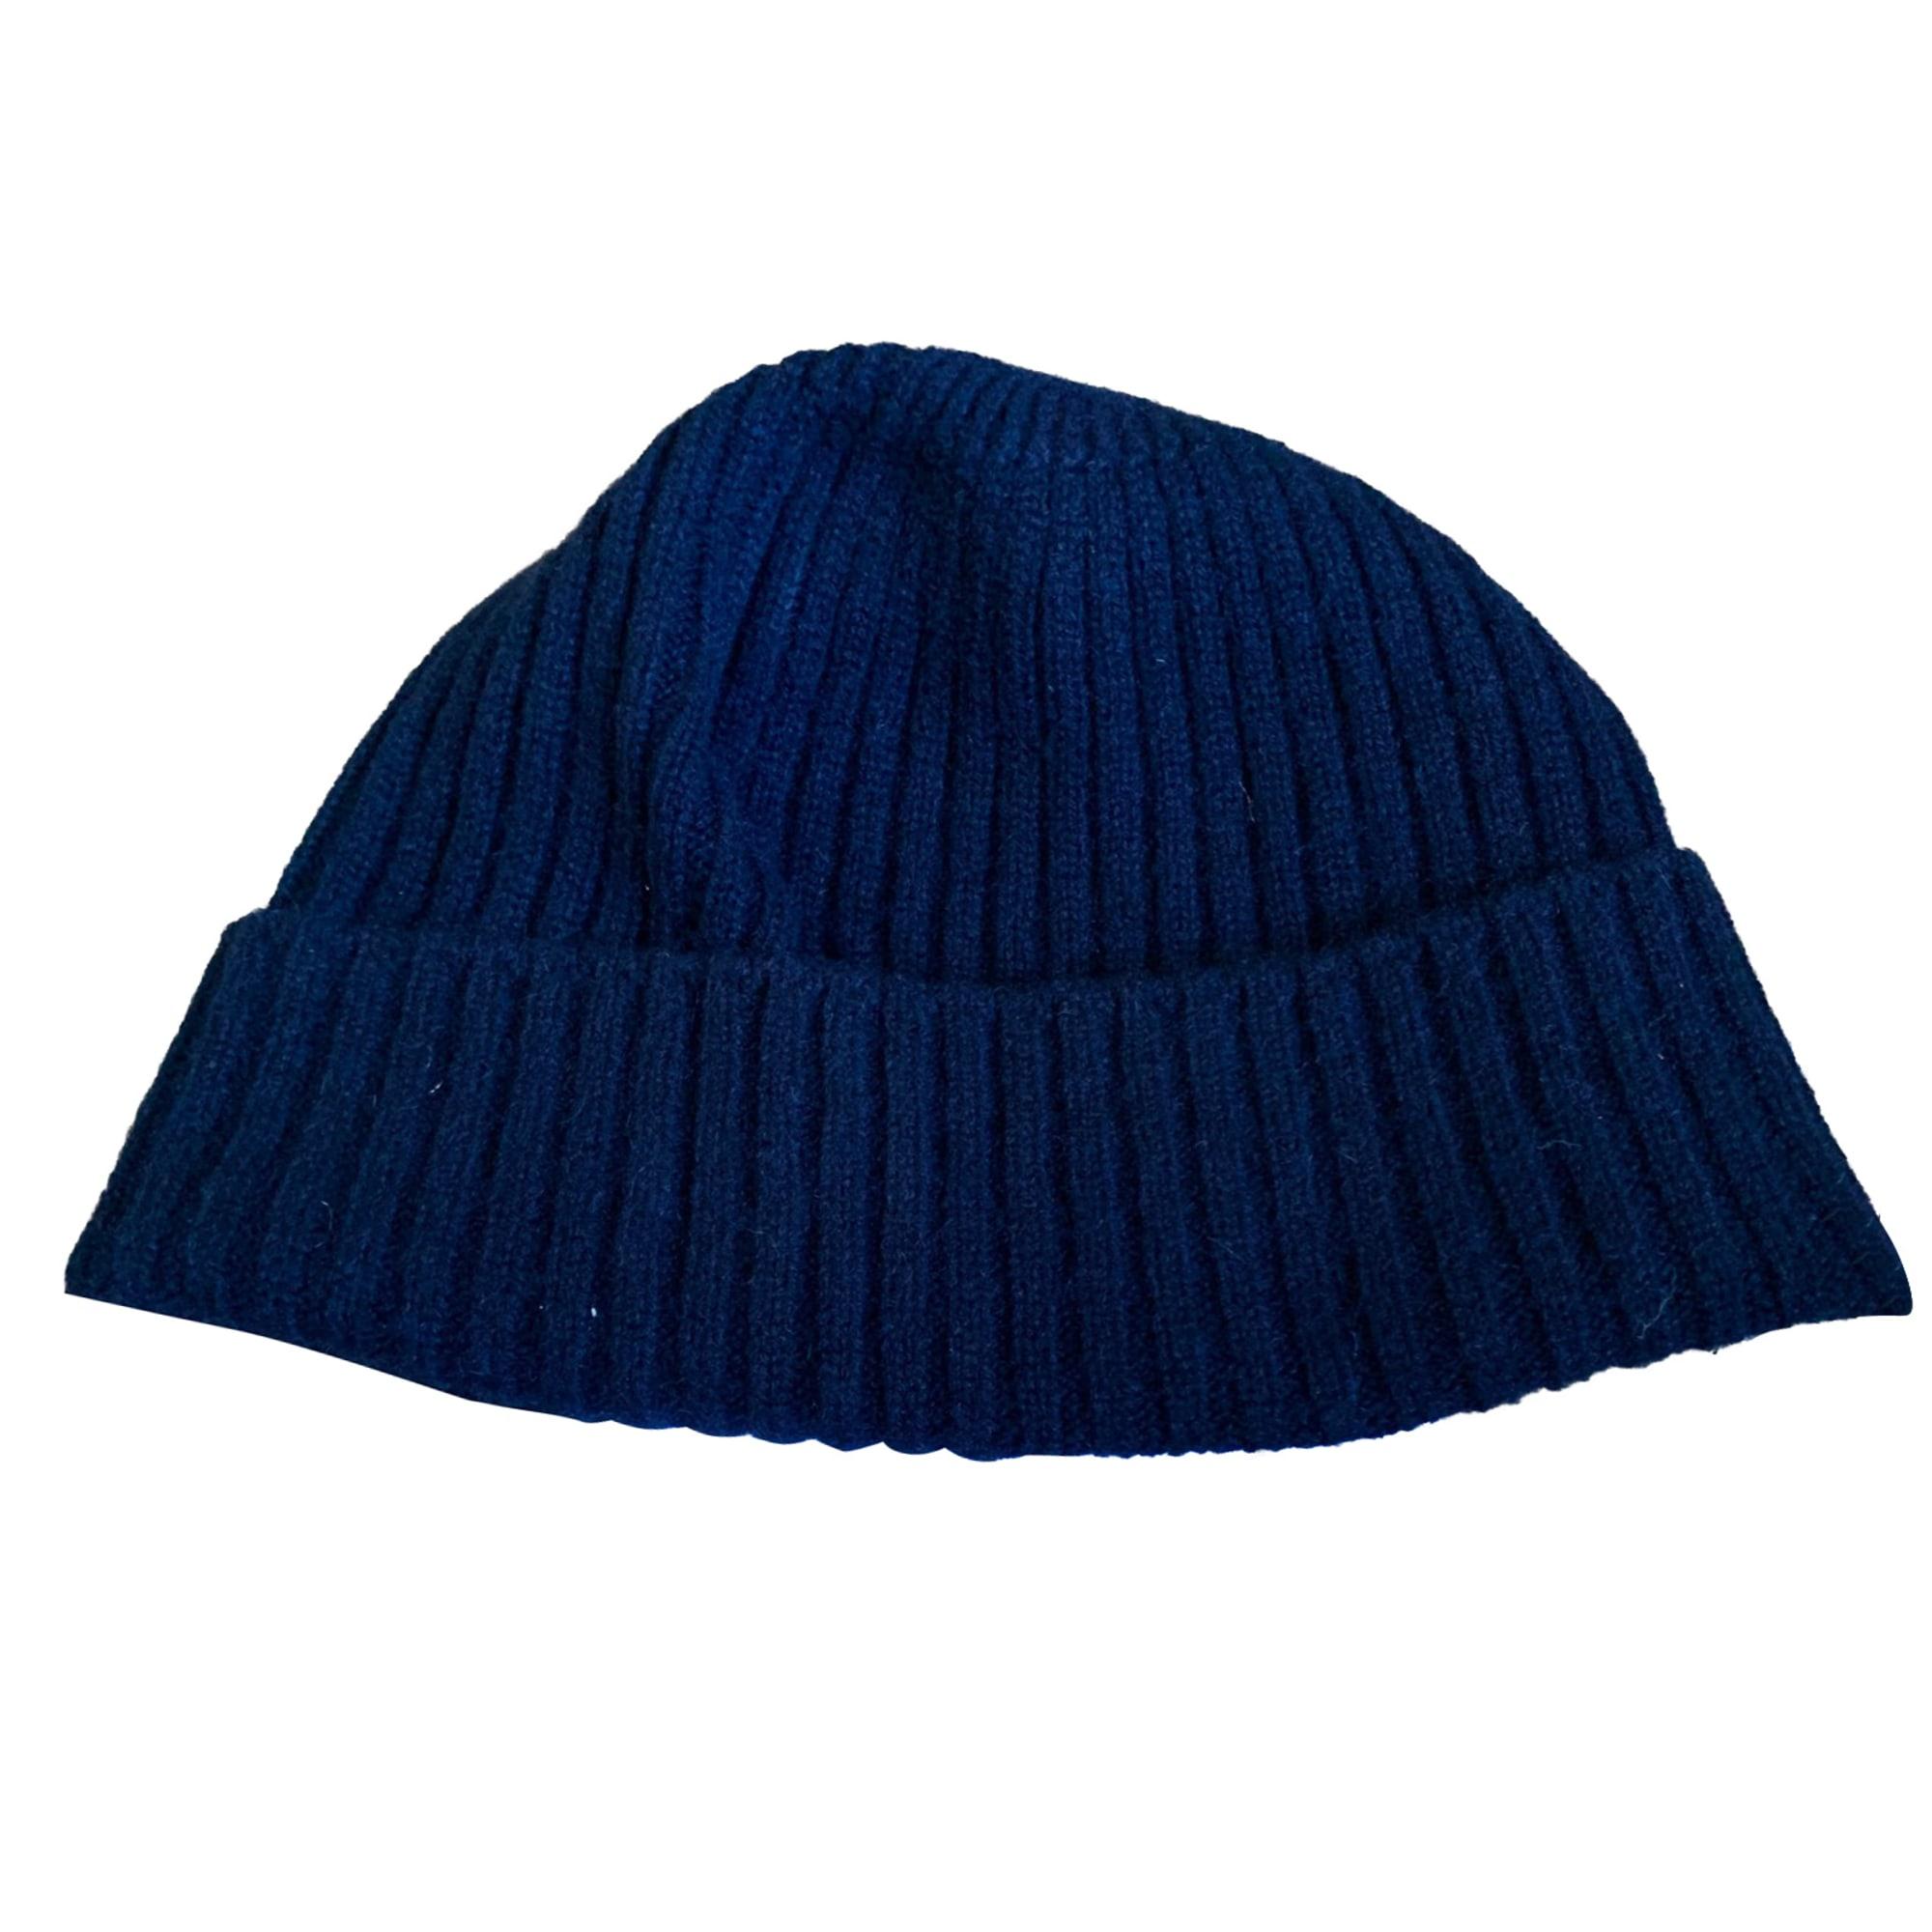 Chapeau MAX MARA Bleu, bleu marine, bleu turquoise